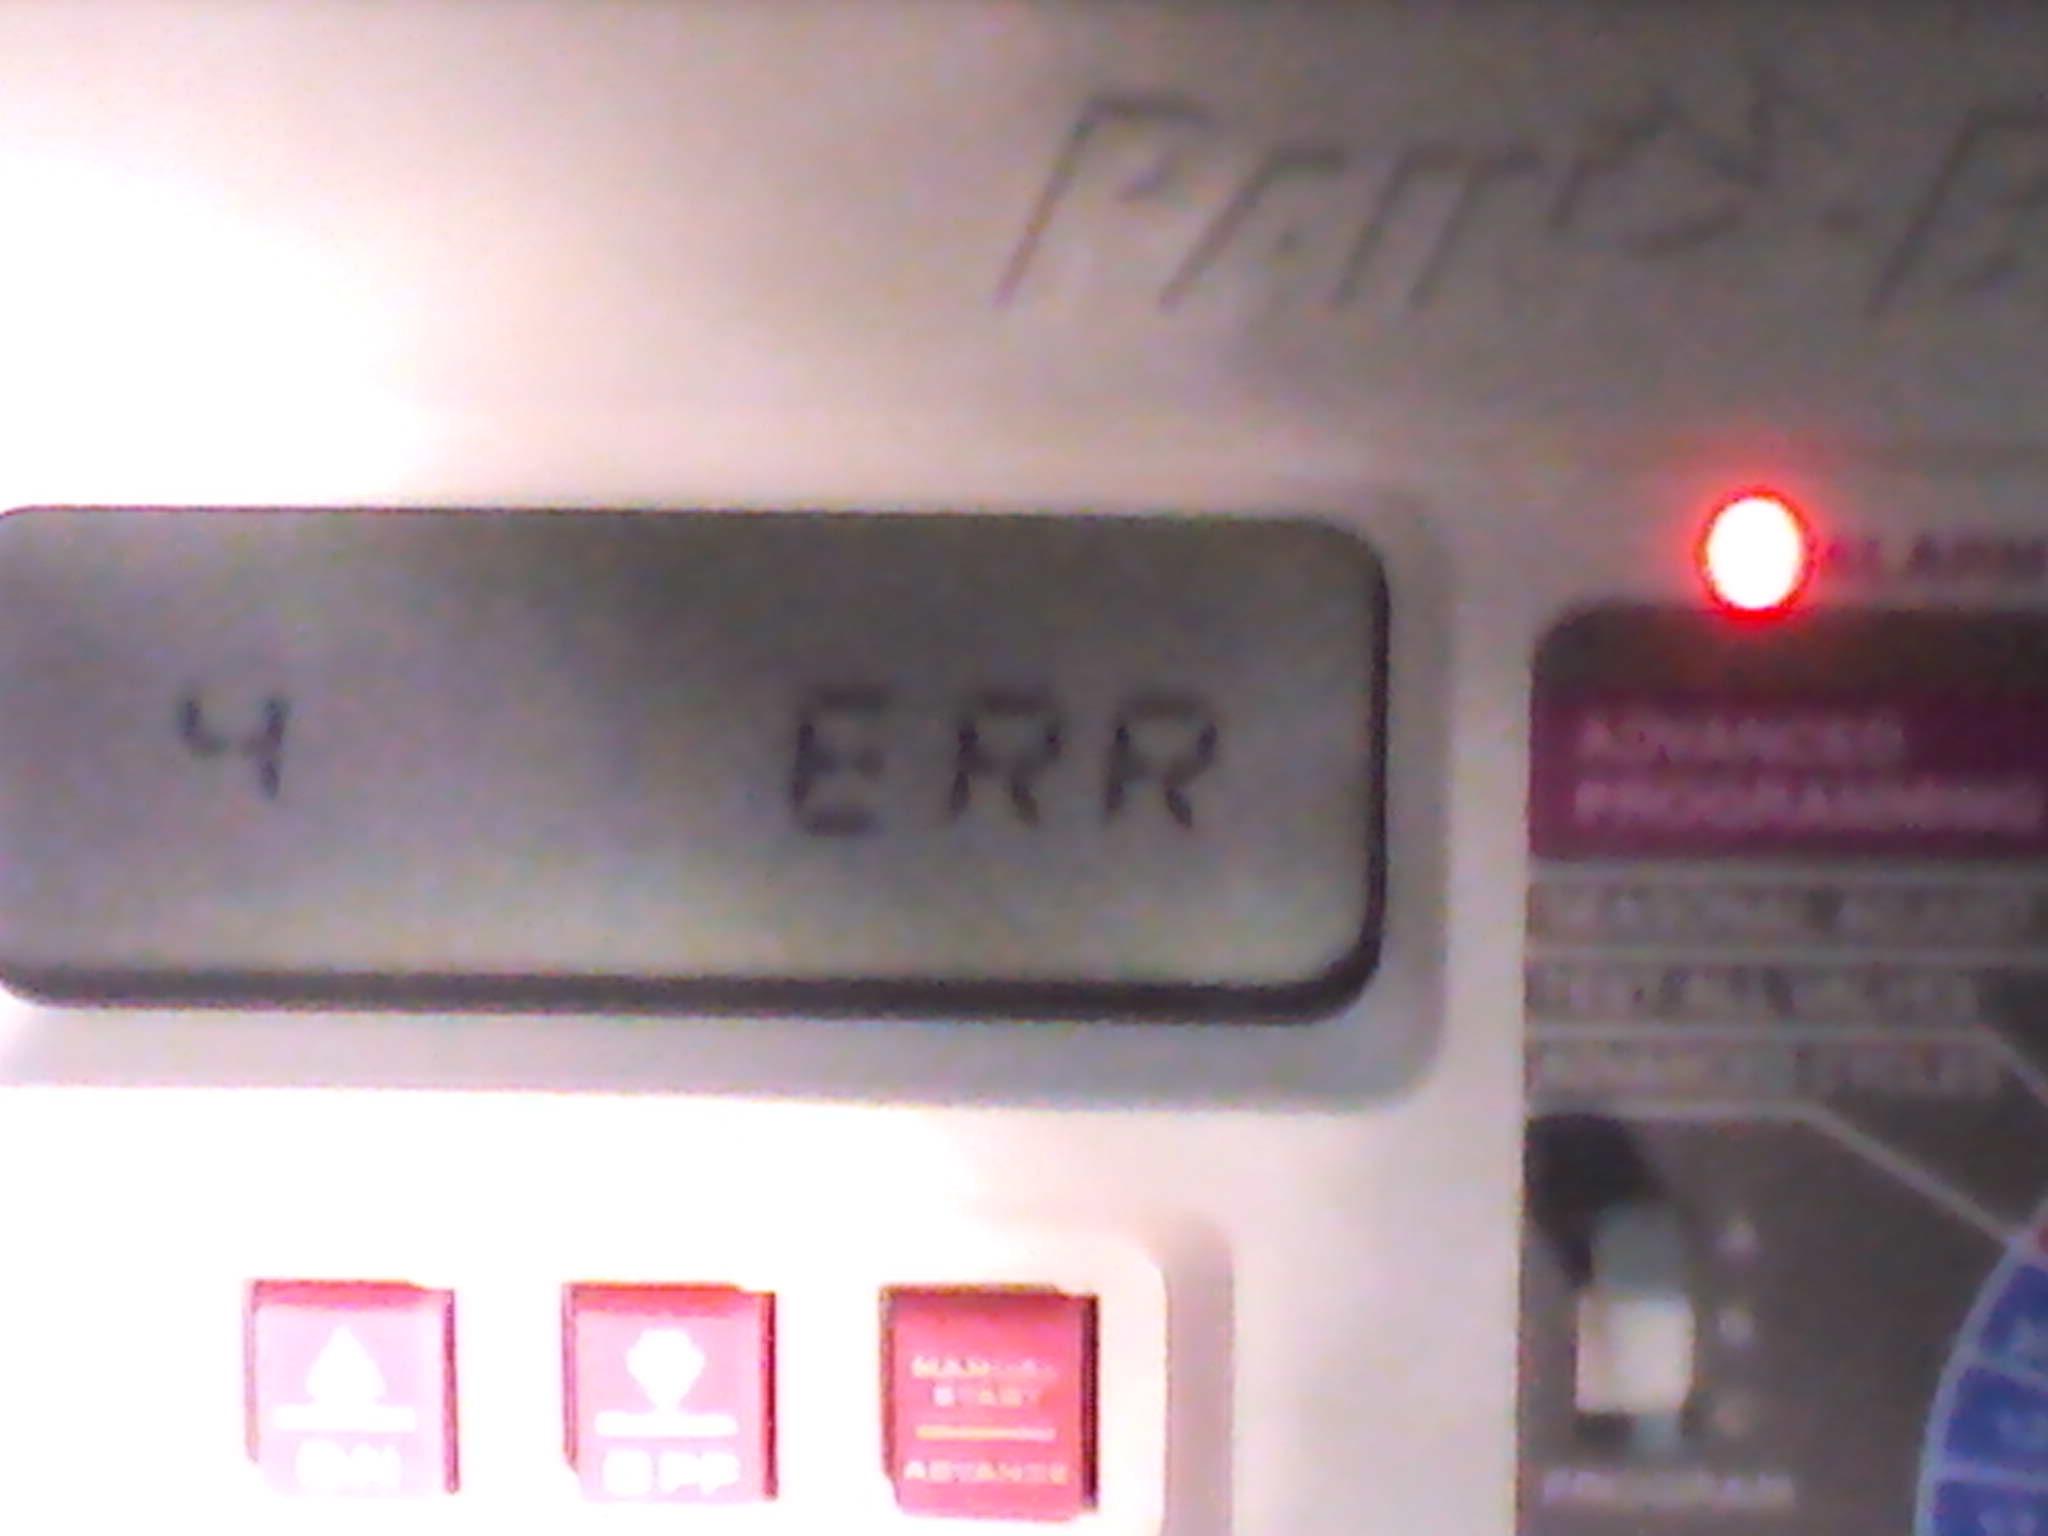 Rainbird Esp Modular Controller Error